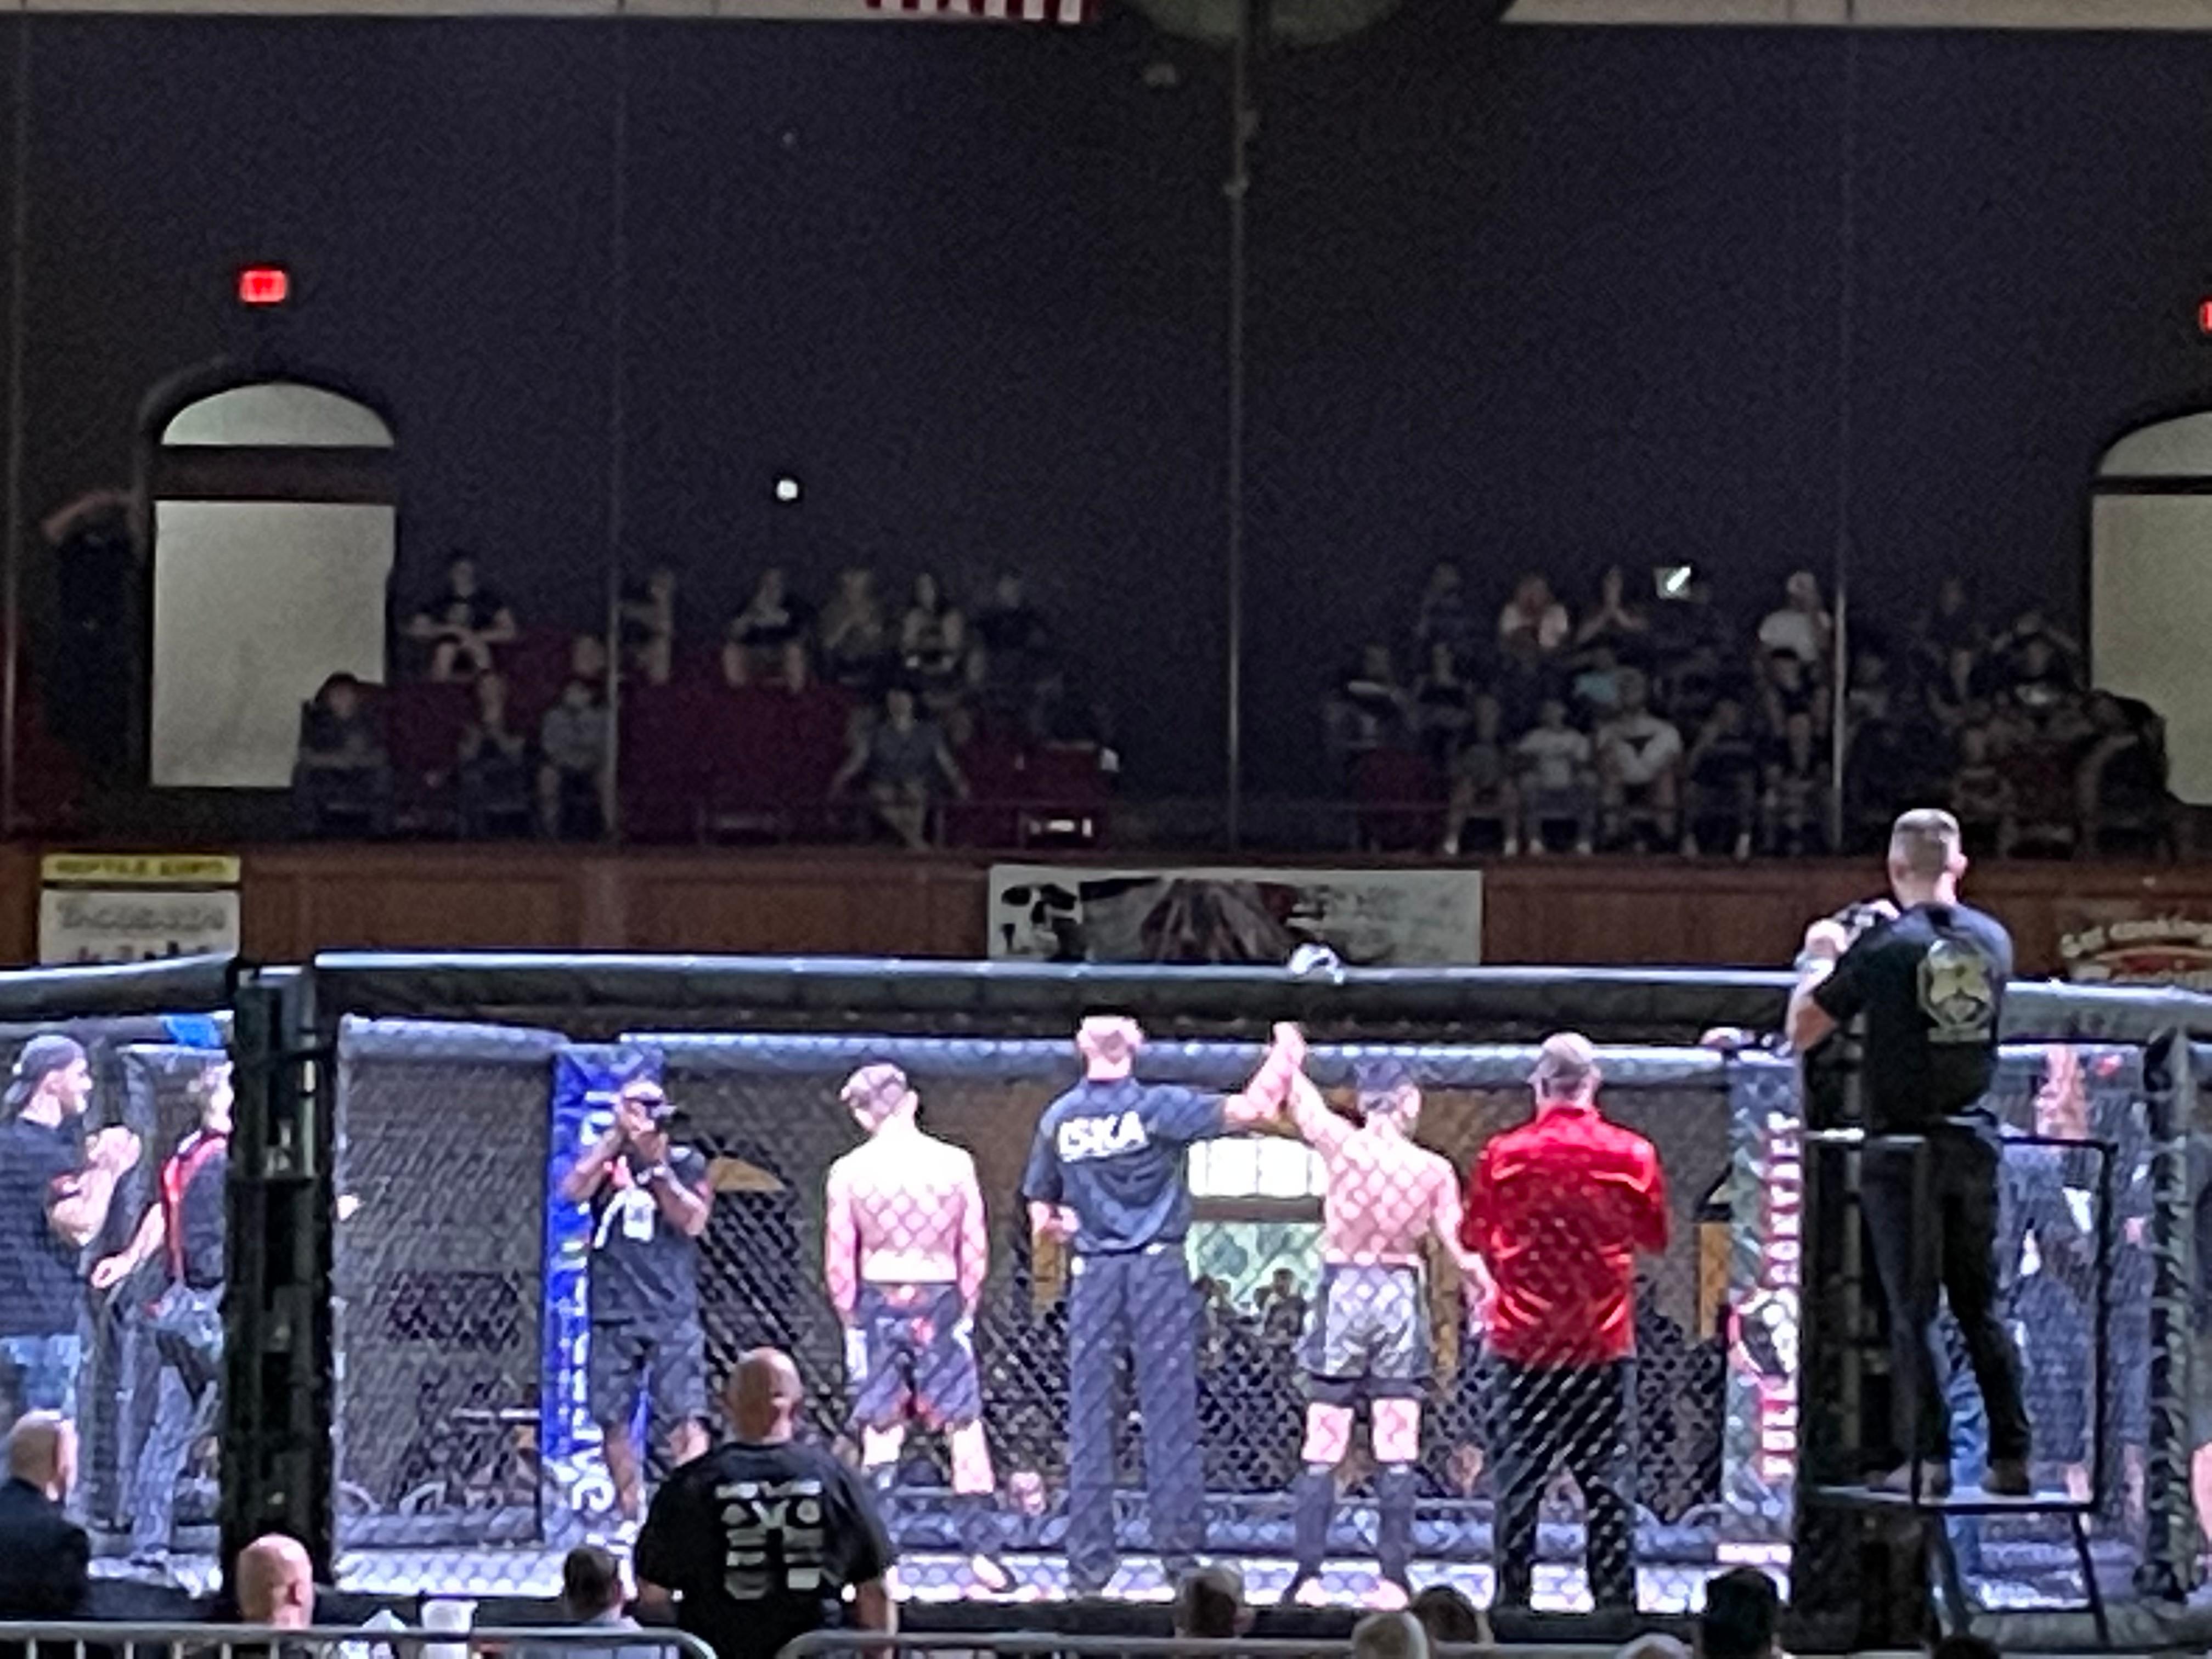 MMA Class Drop In